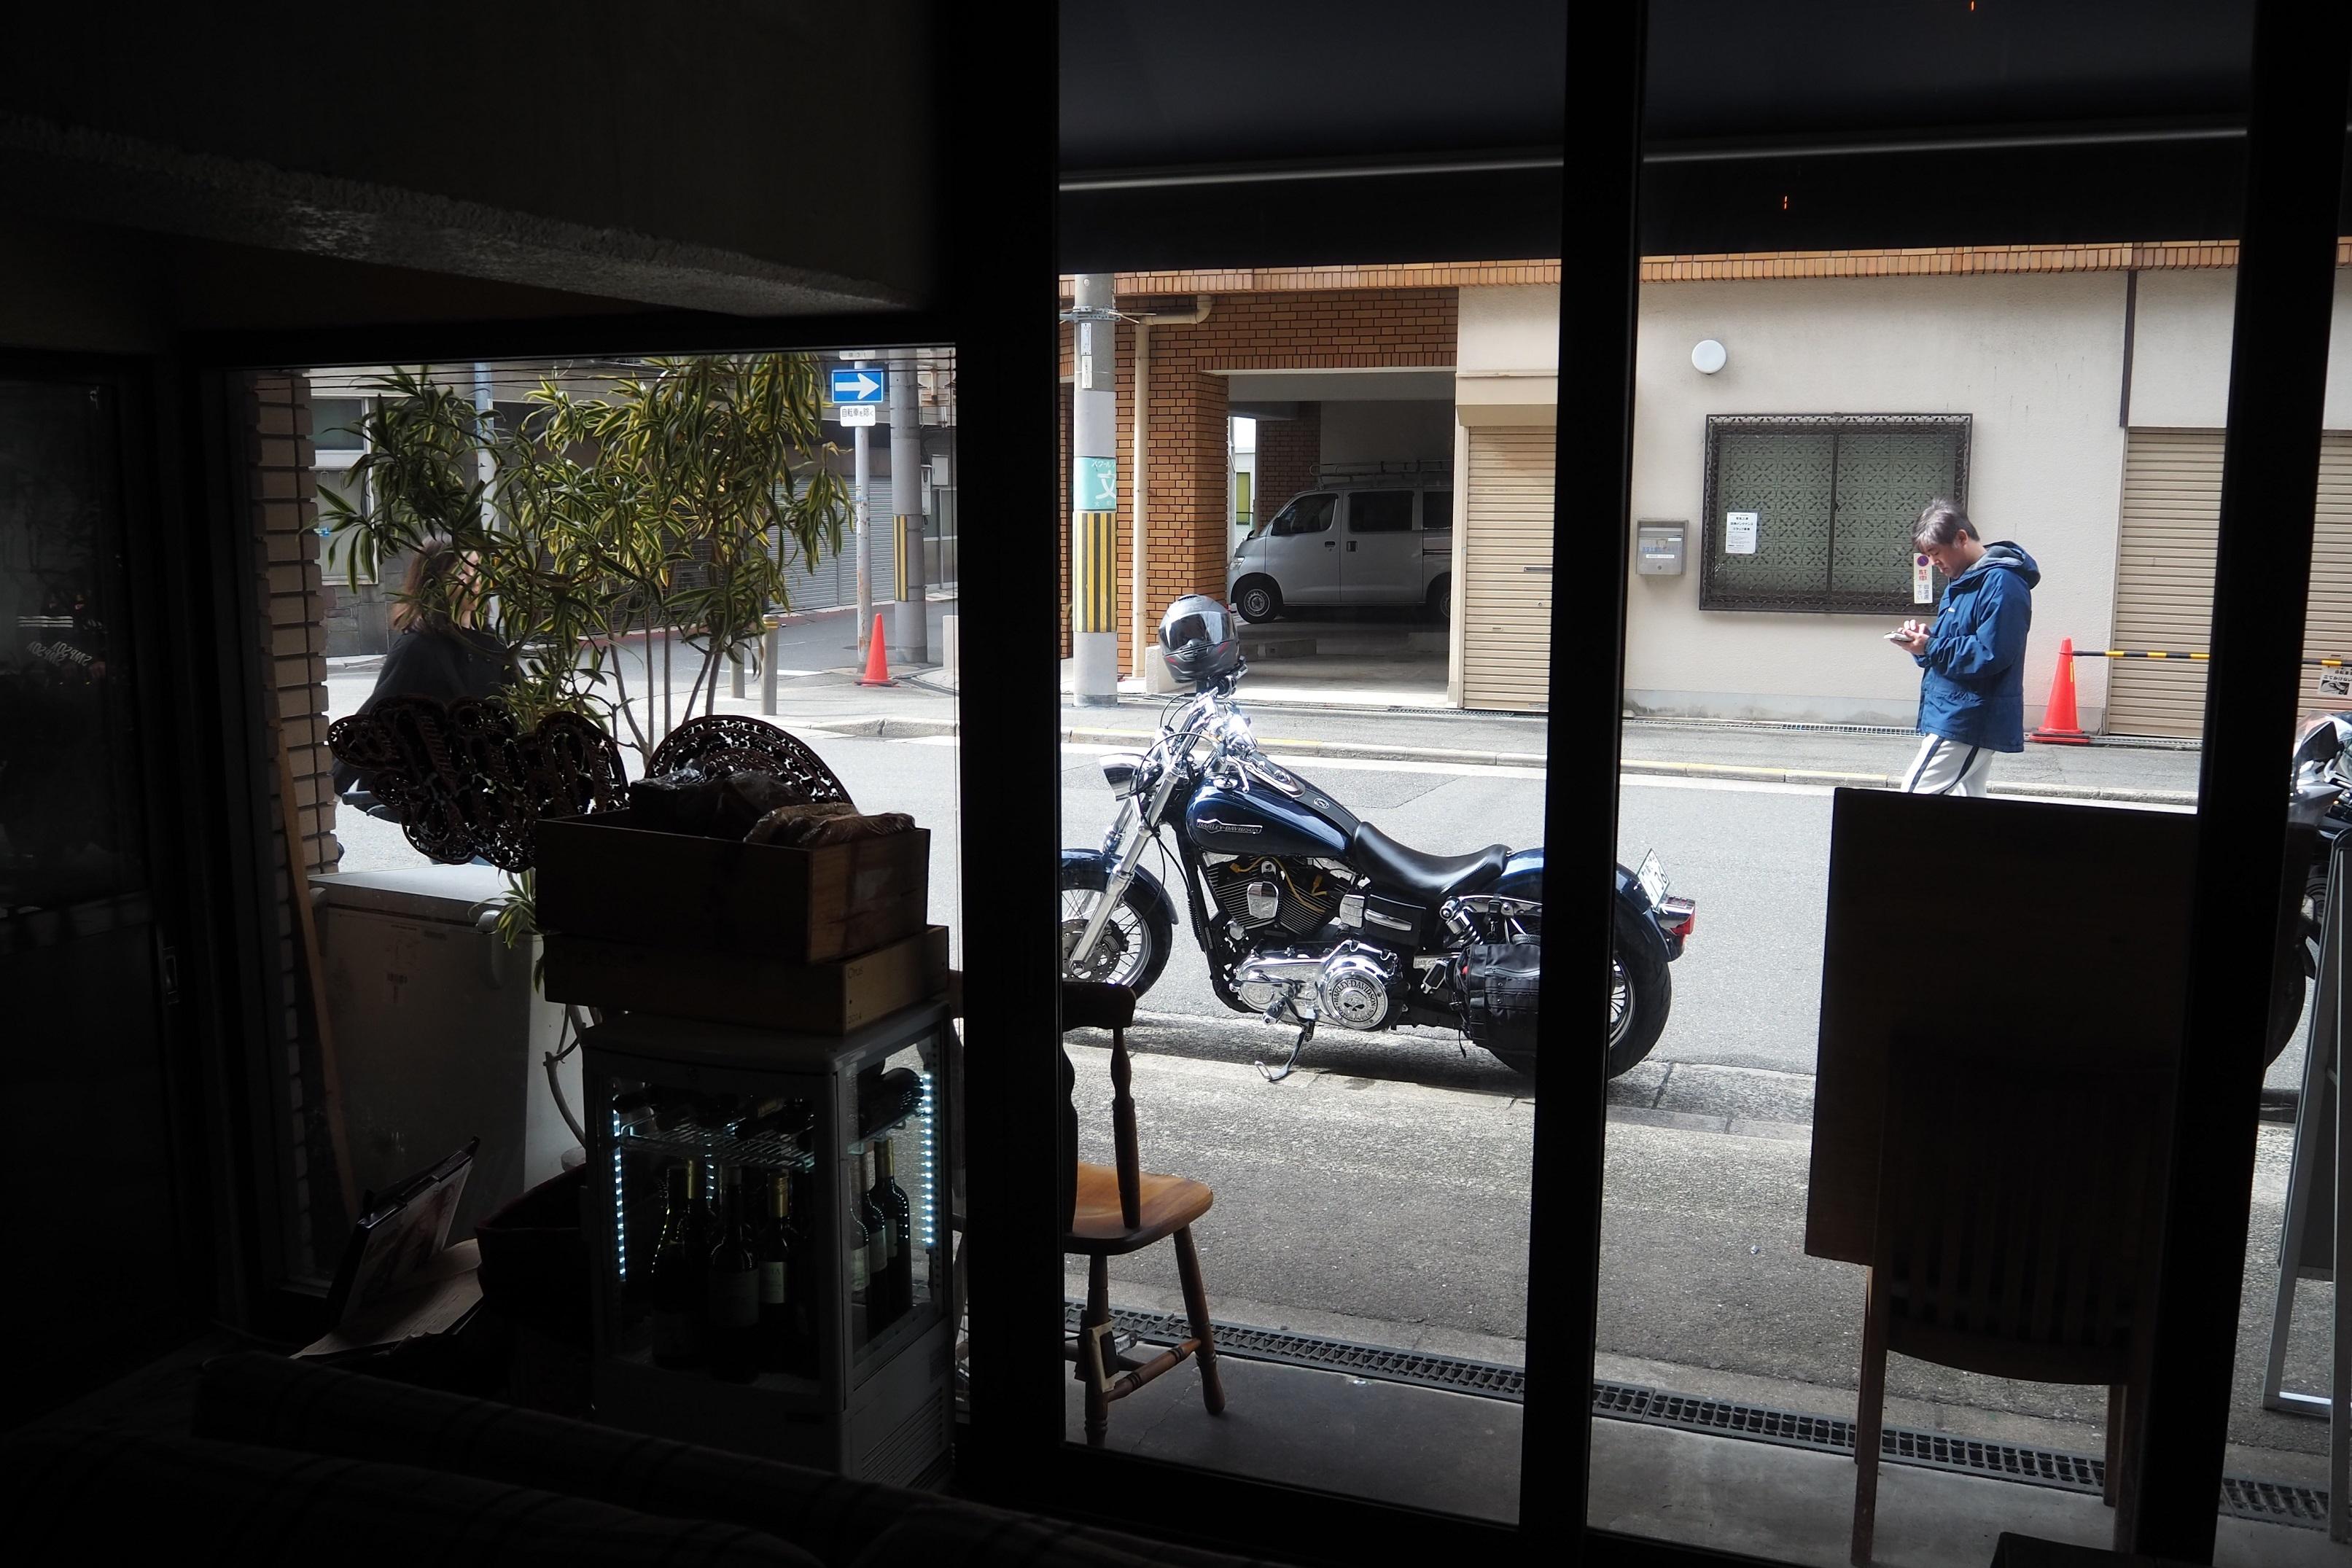 harleydavidson-motorcycle-touring-blog-deli-kado-horie-3.jpg